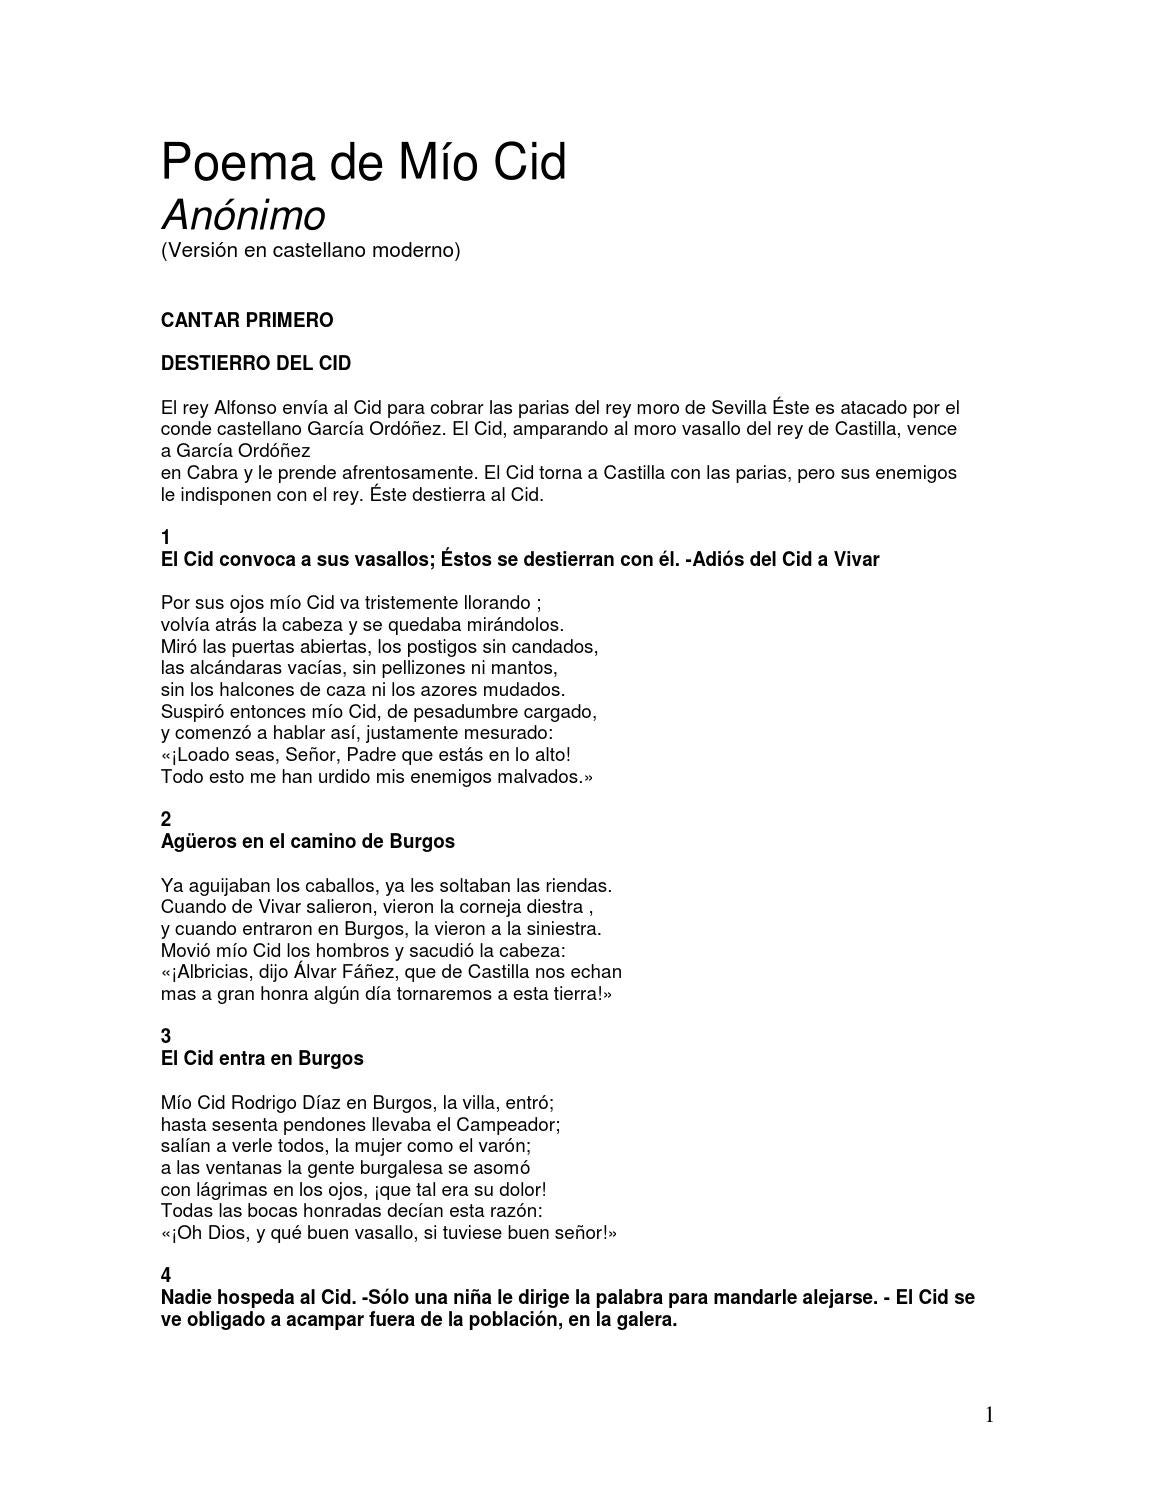 Poema De Mio Cid 1er Cantar By David Steven Barrios Martinez Issuu